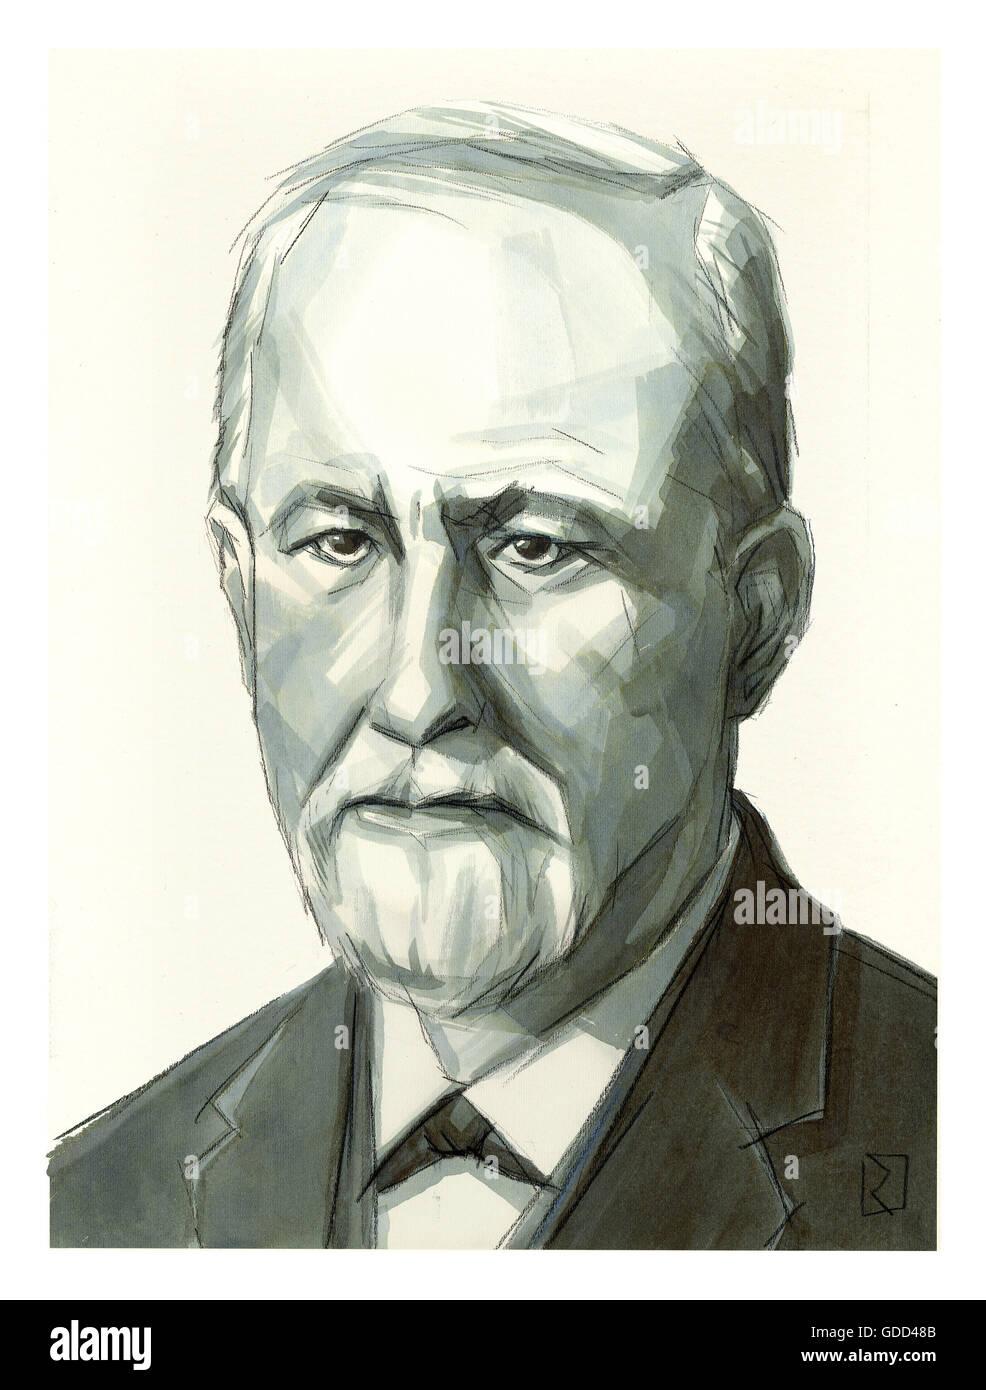 Freud, Sigmund  6.5.1856 - 23. 9.1939, Austrian medic / physician (medical doctor), portrait, monochrome drawing - Stock Image